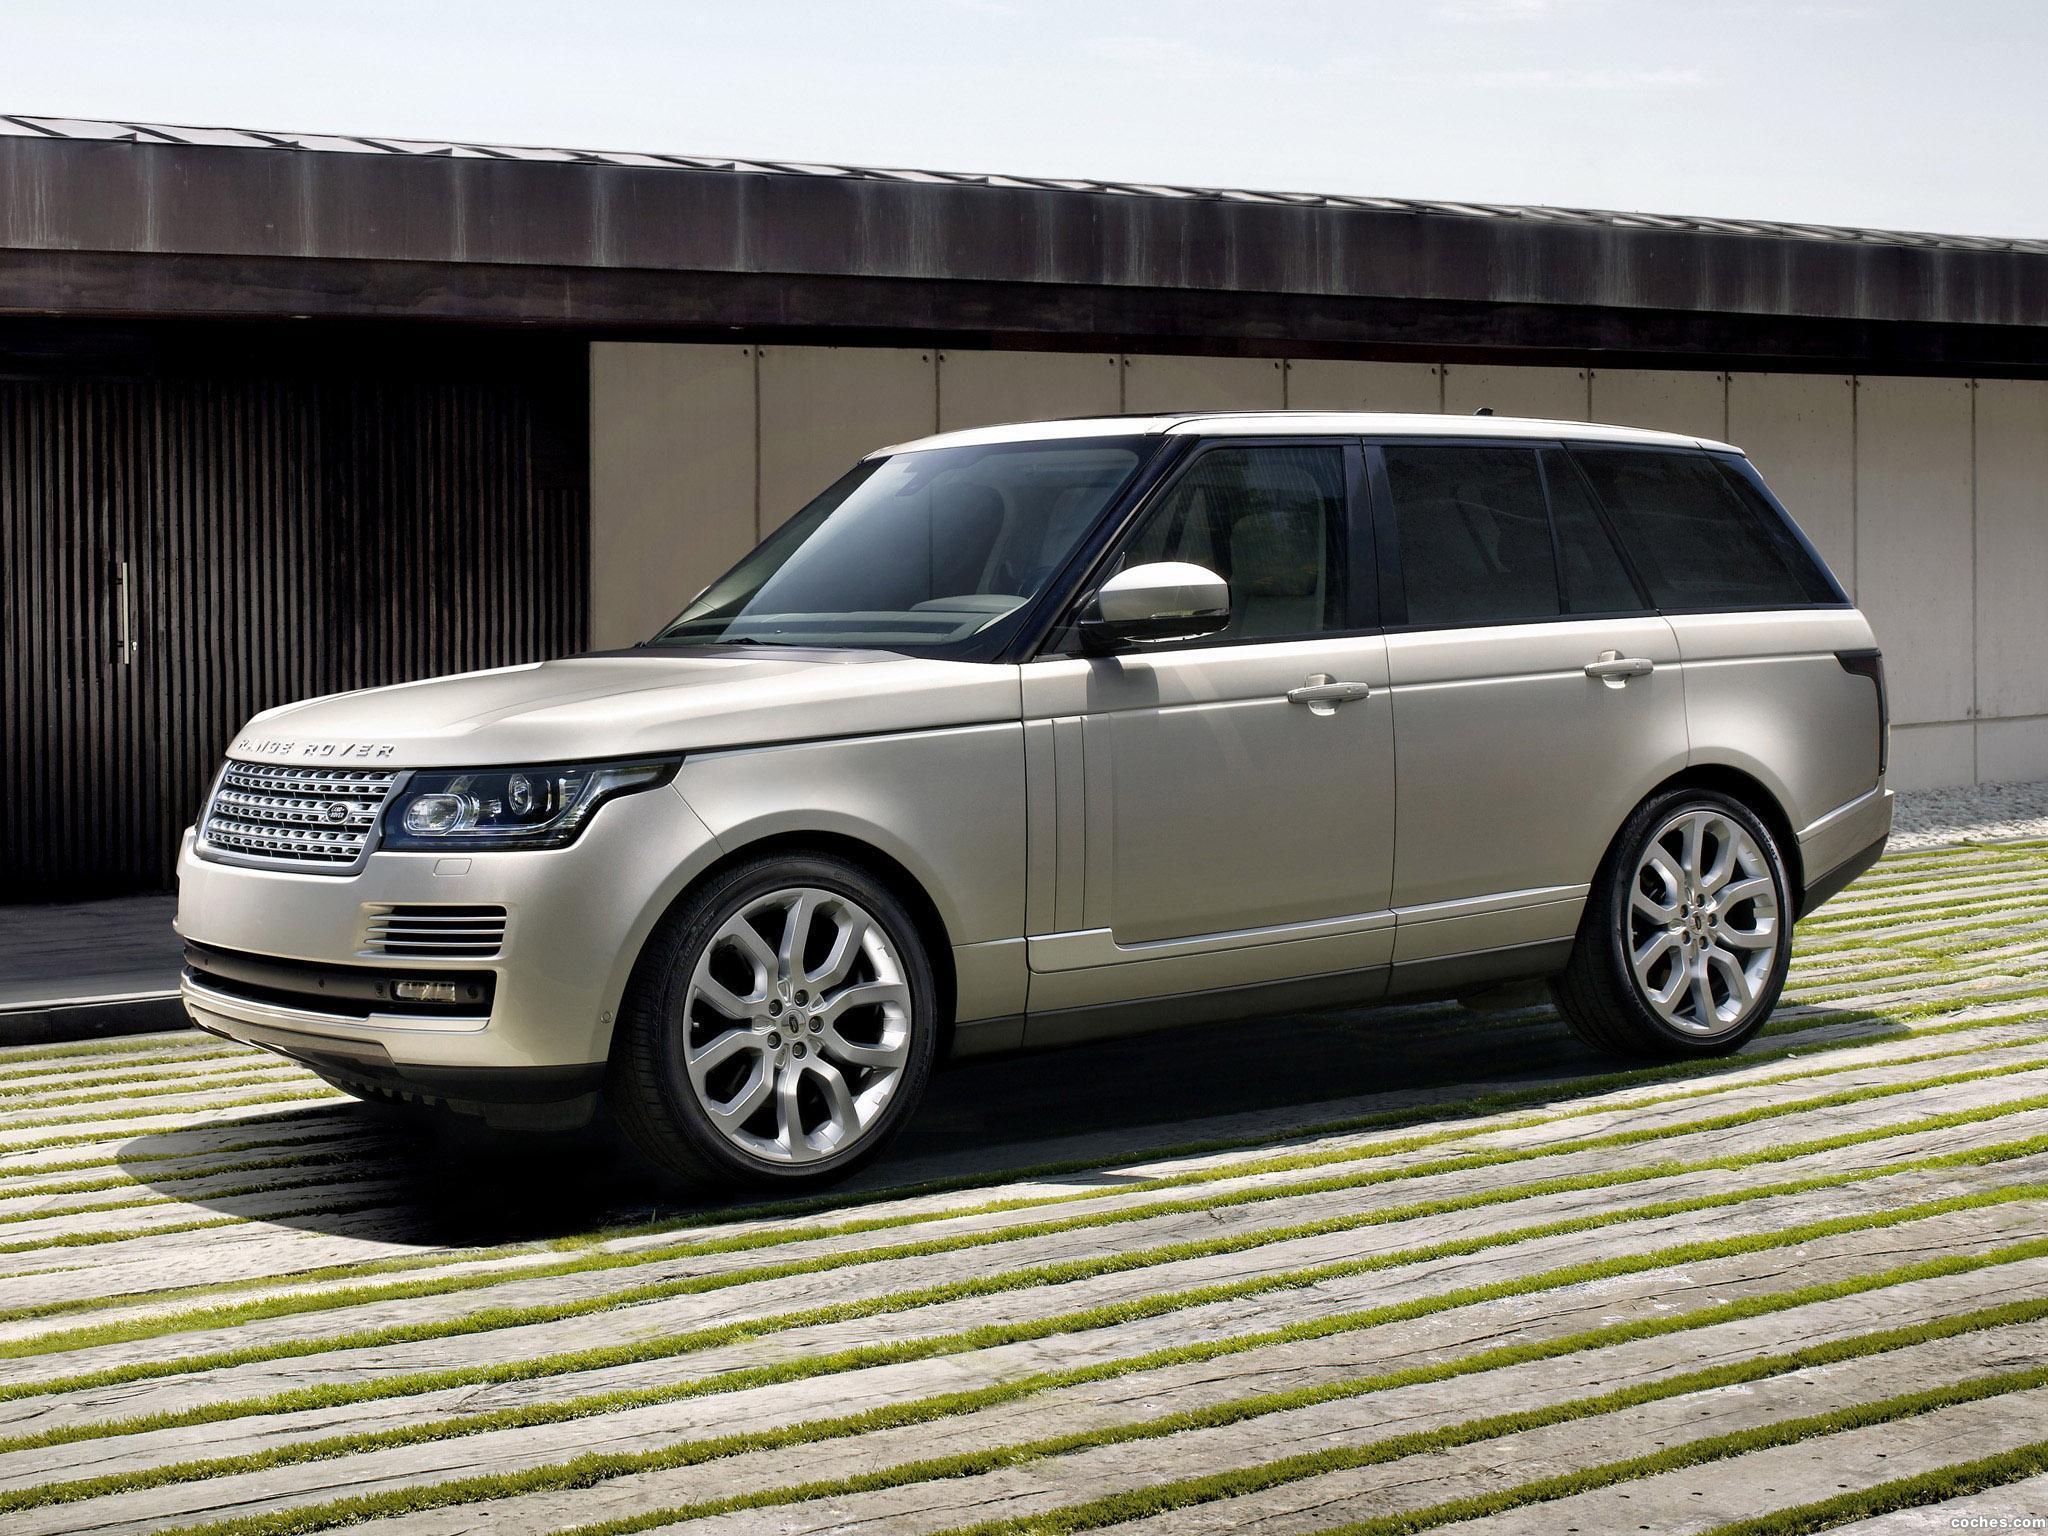 Foto 0 de Land Rover Range Rover (L405) 2013